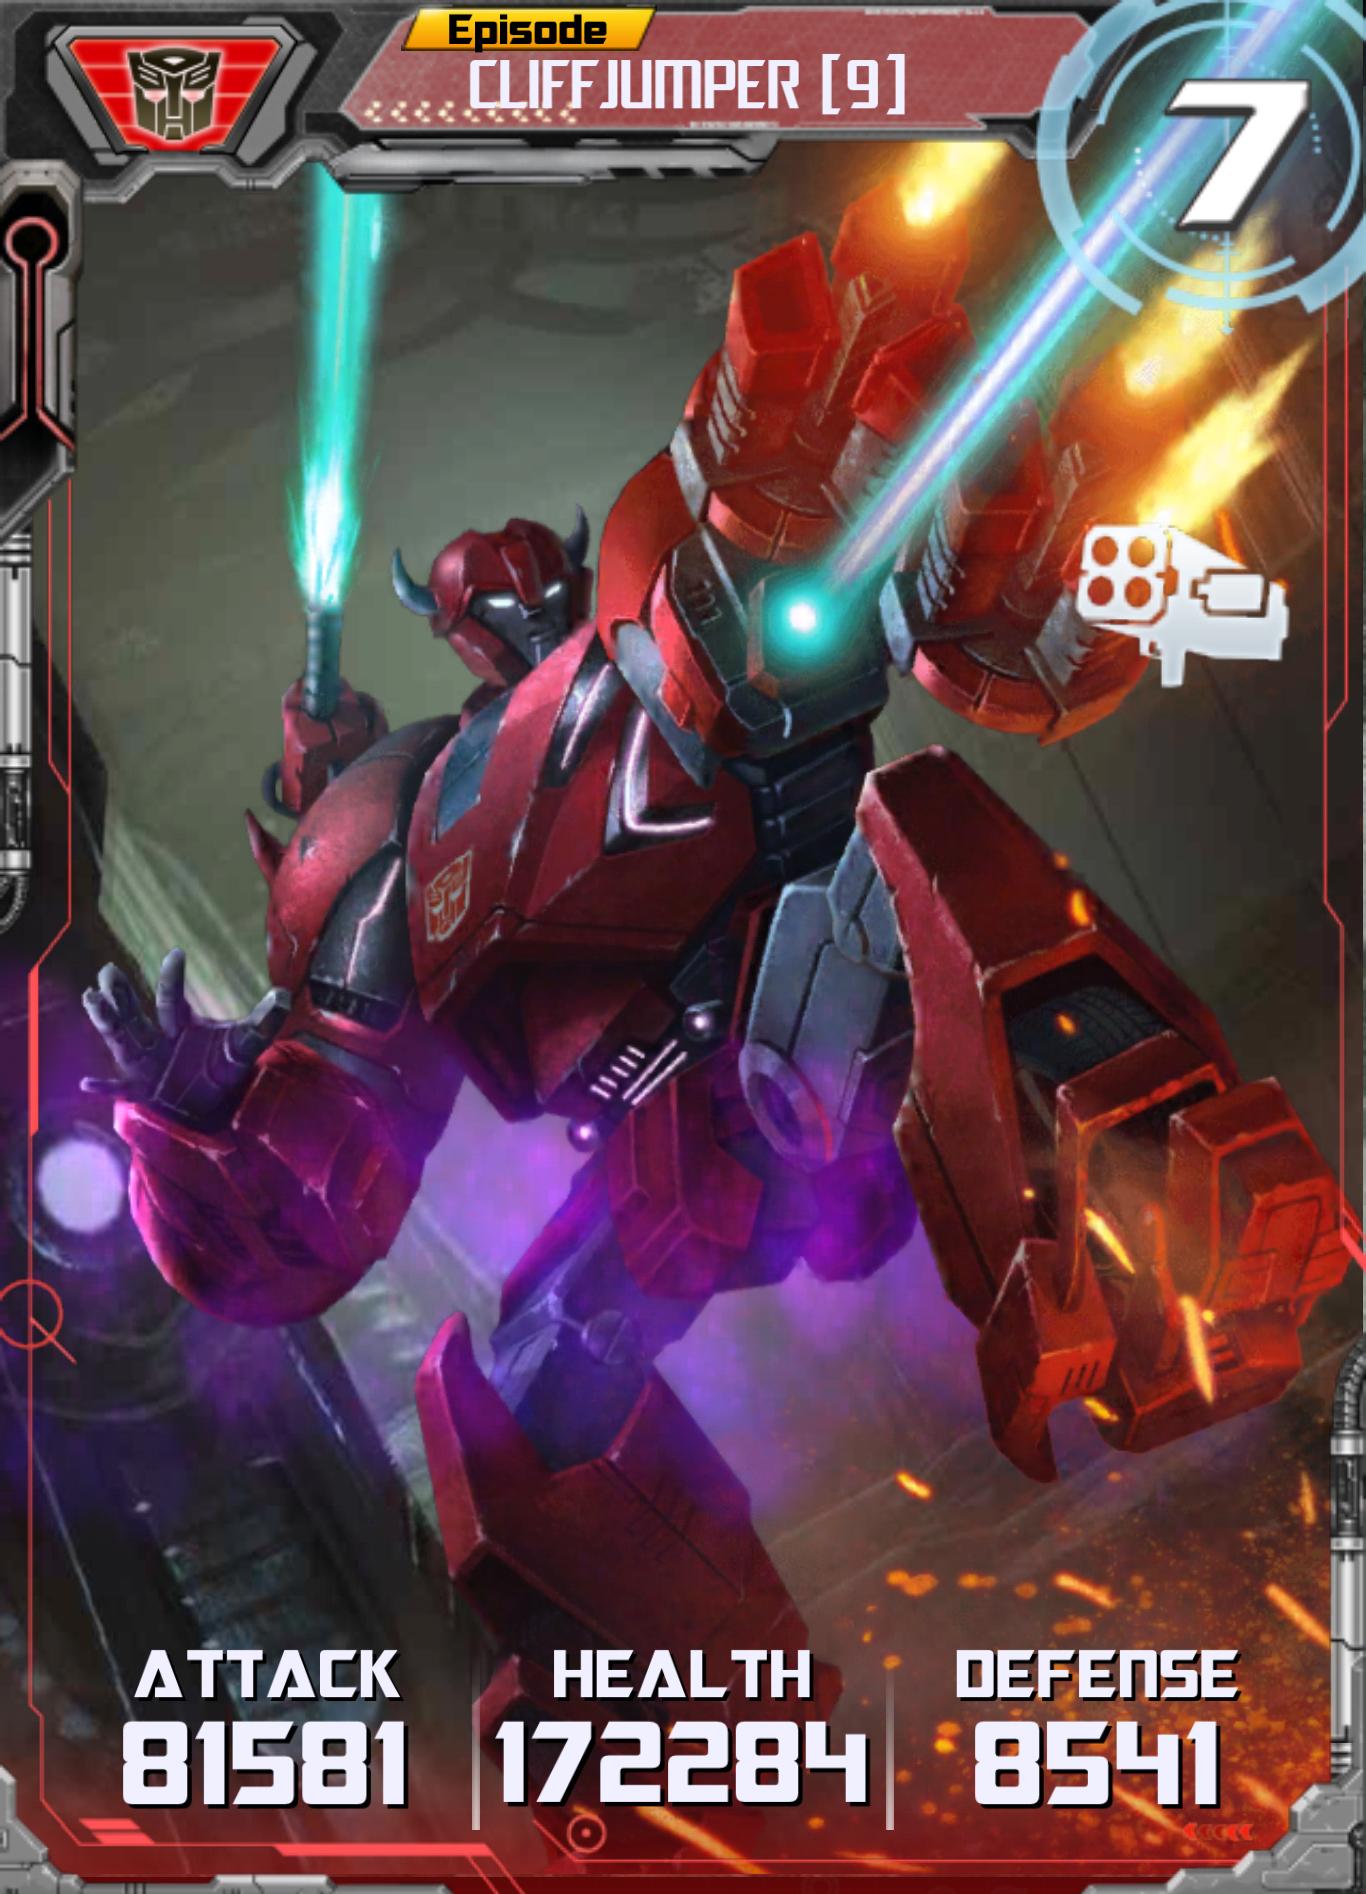 Cliffjumper (9)   Transformers Legends Wiki   FANDOM powered by Wikia